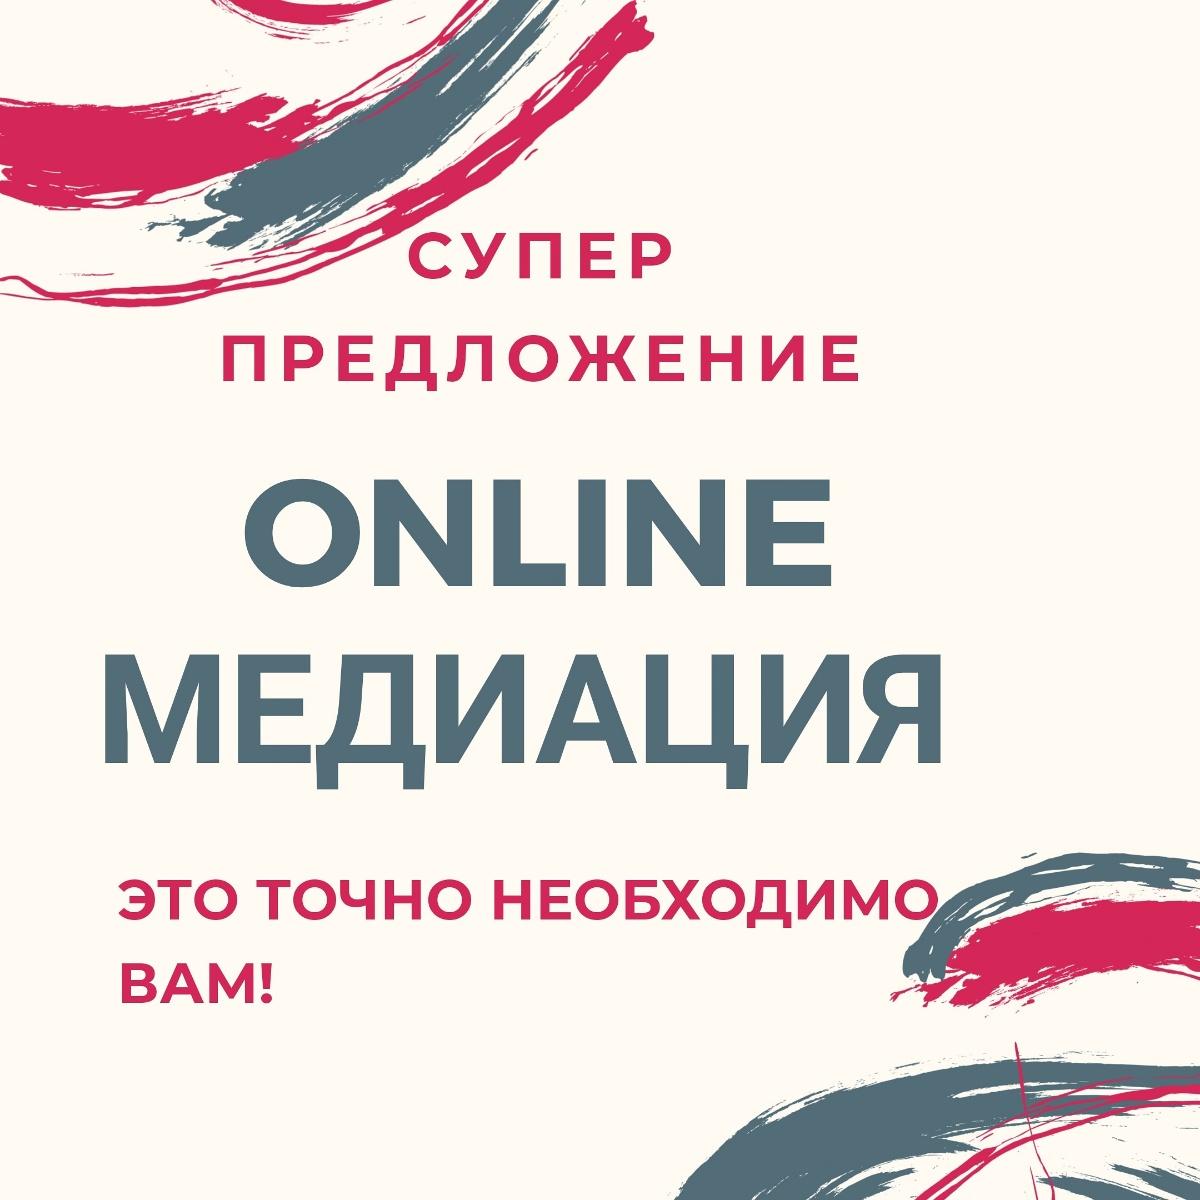 Online МЕДИАЦИЯ